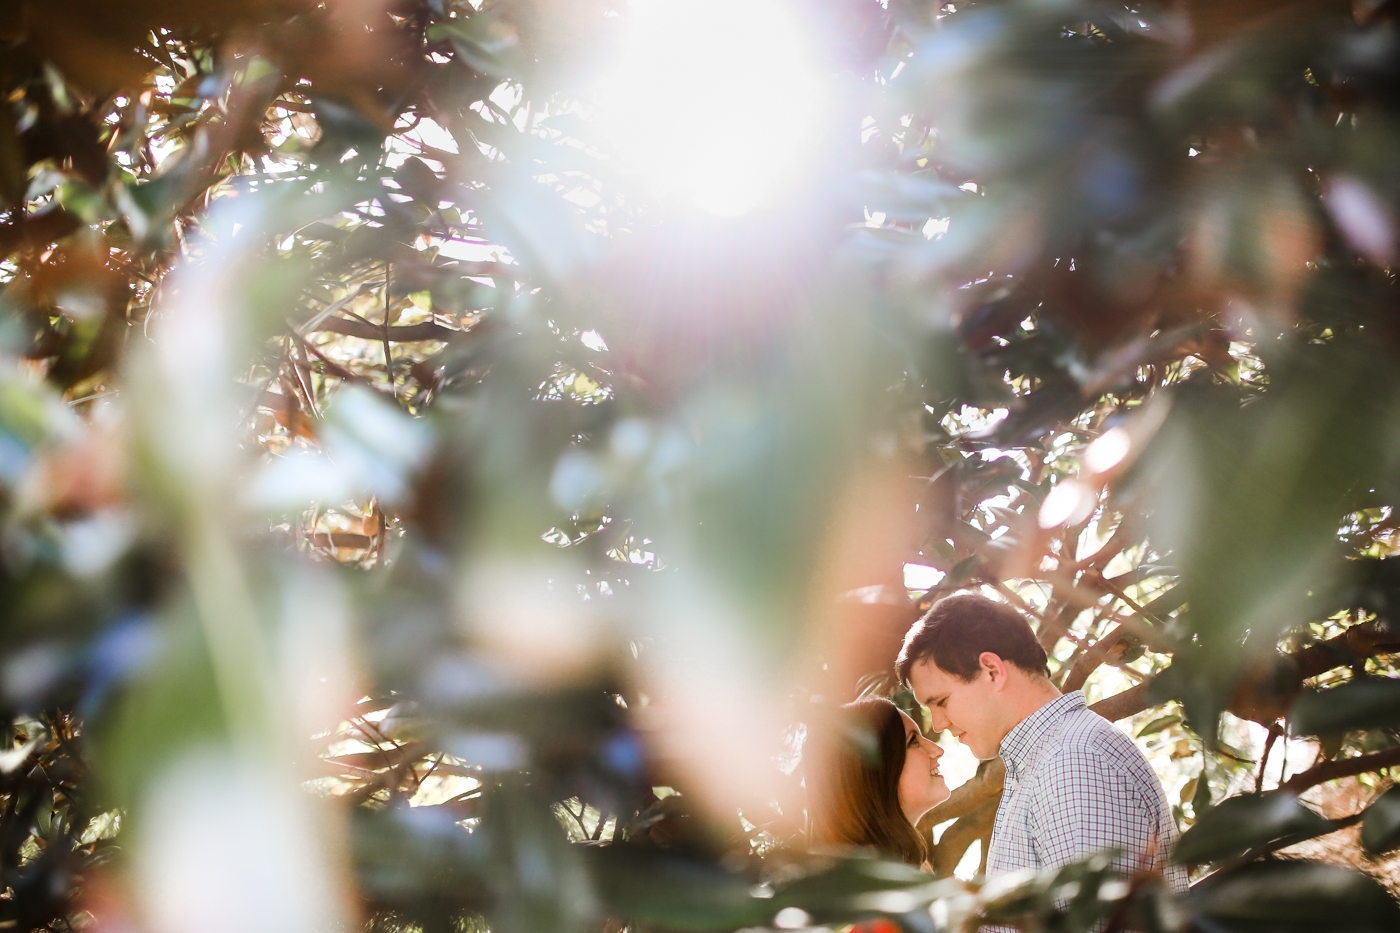 White-hall-louisville-kentucky-engagement-best-wedding-photographer-8.jpg